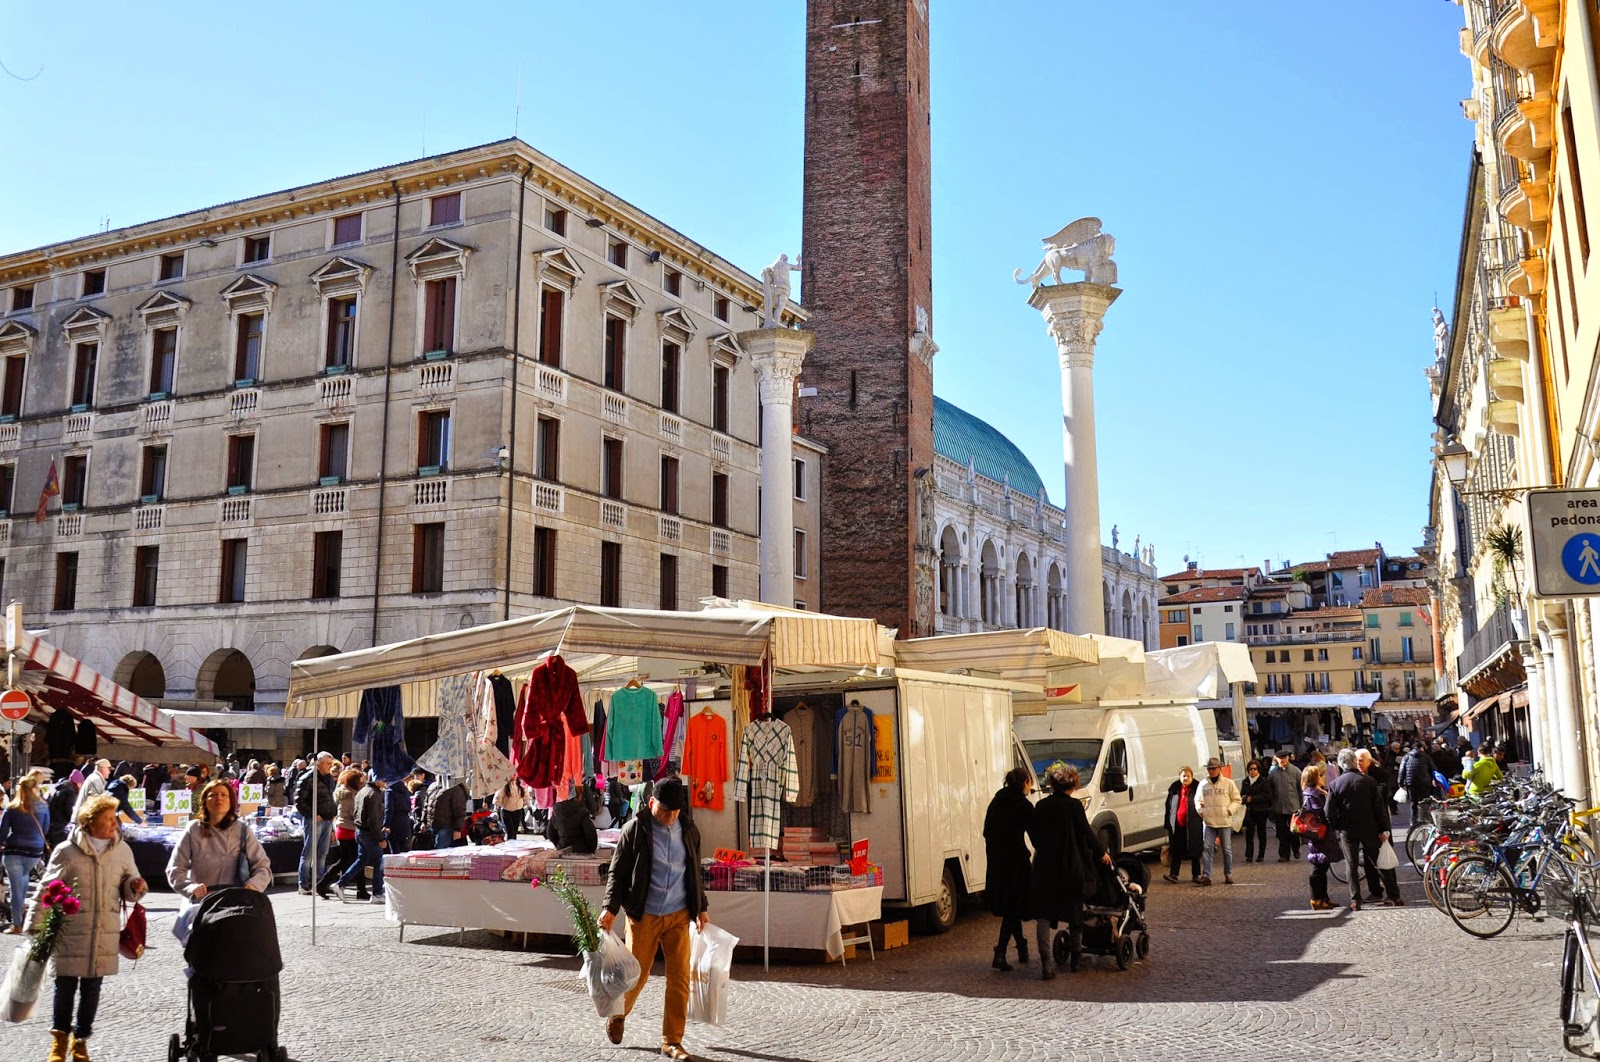 The Thursday market at Piazza dei Signori, Vicenza, Italy